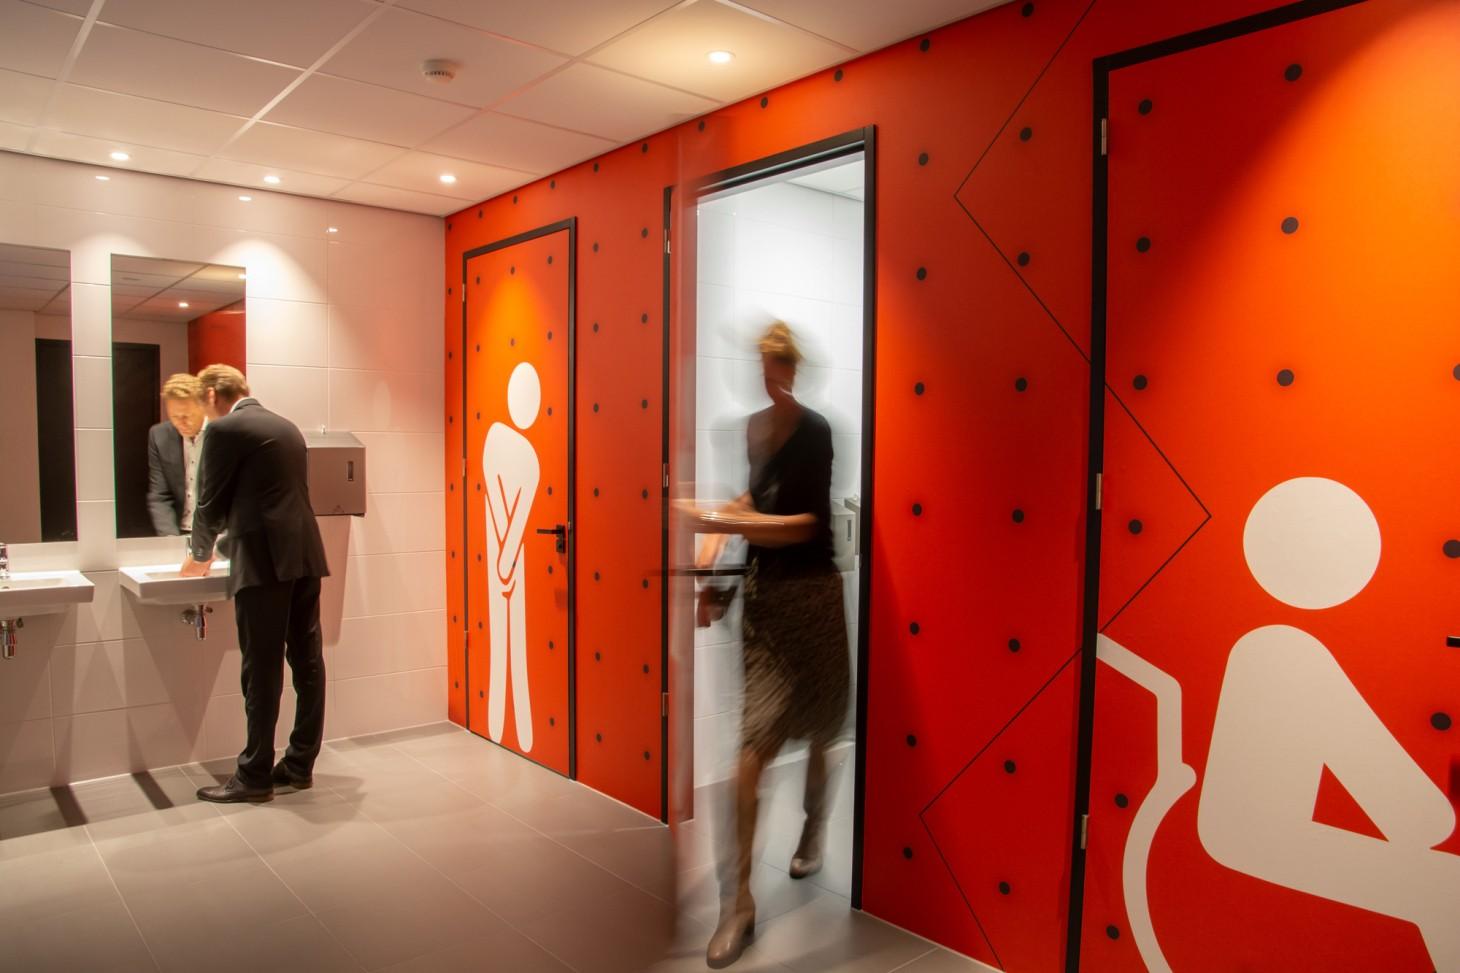 Tausch Medica Oss VIZIO wallcovering glasfolie print full color signing wandprint airtex